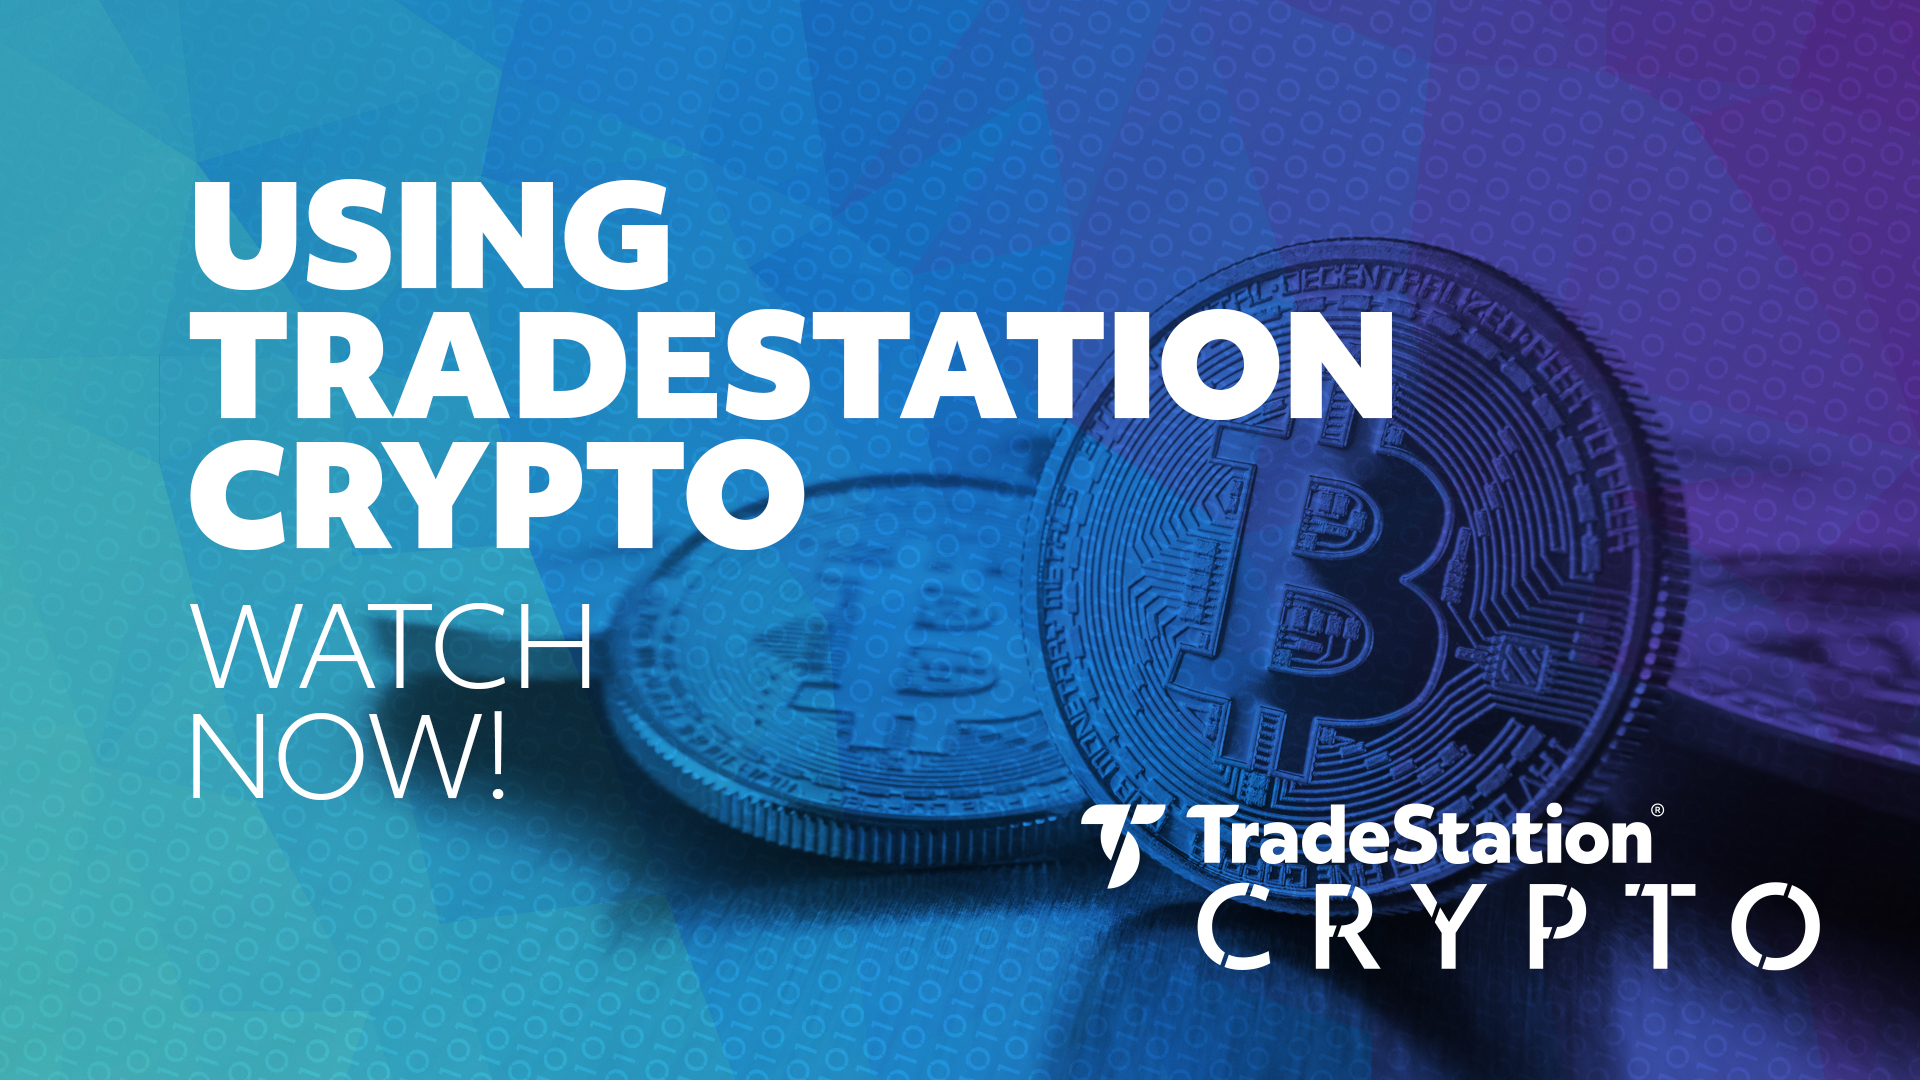 tradestation bitcoin